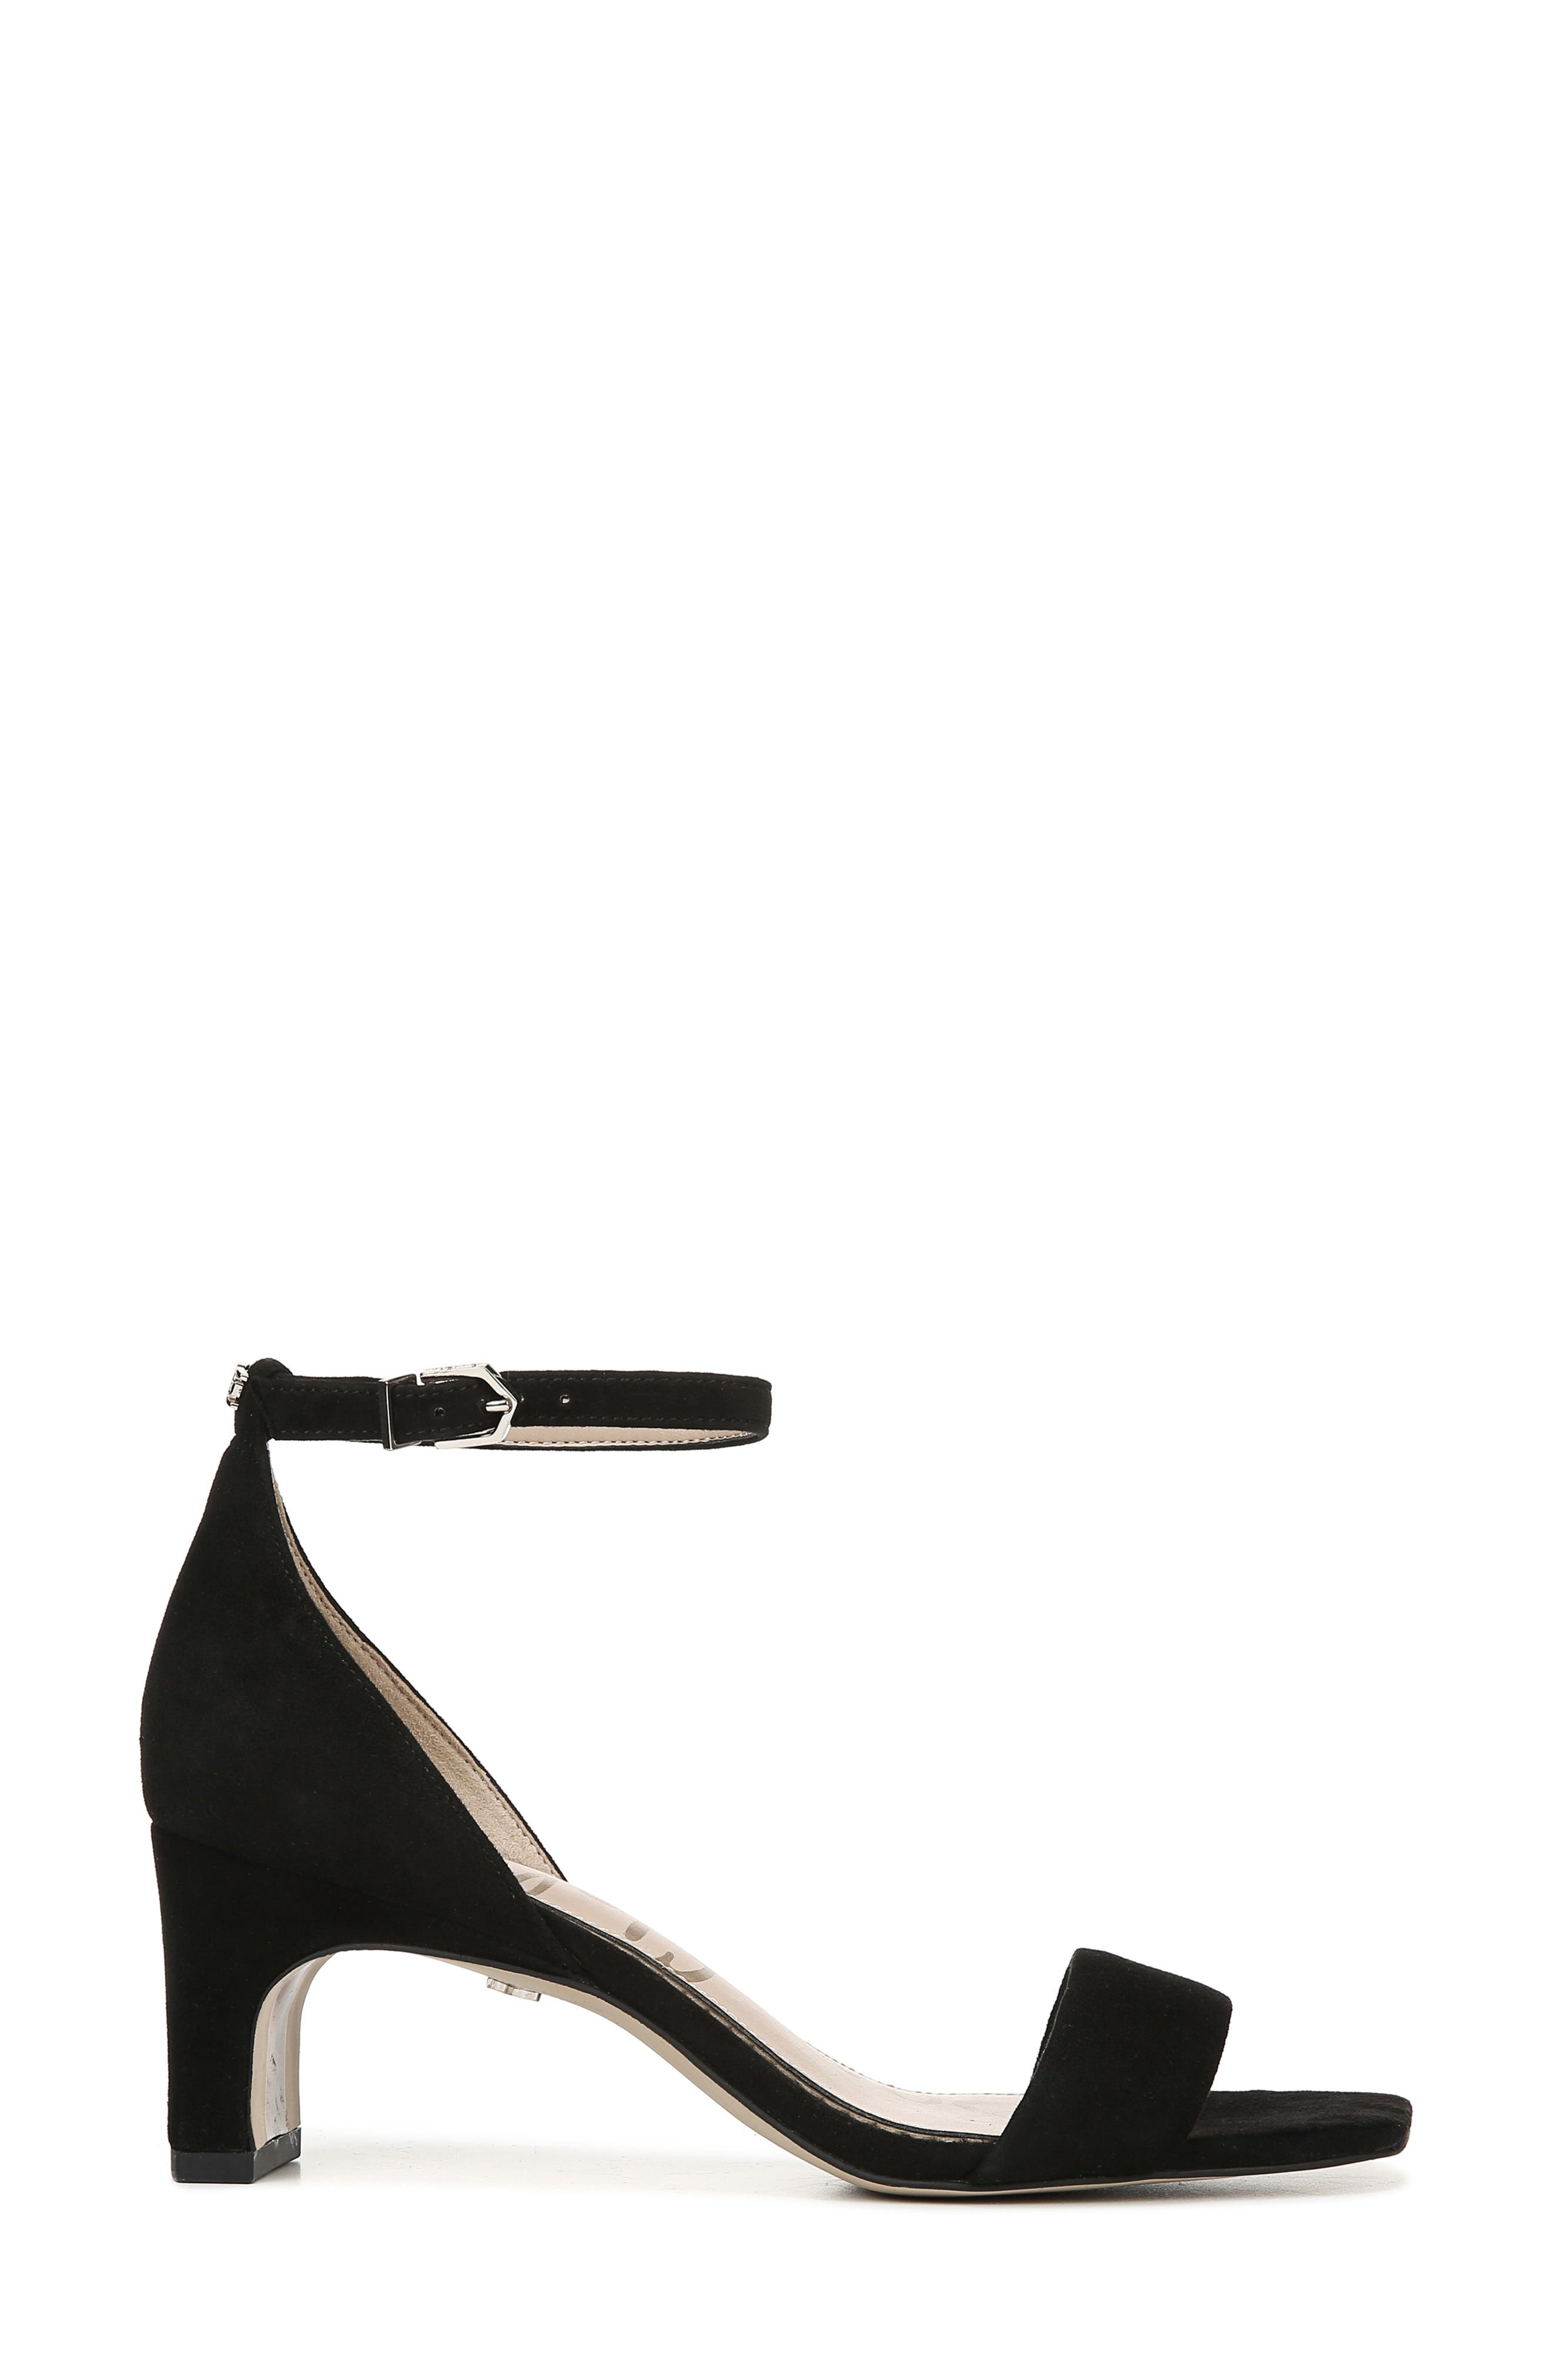 SAM EDELMAN, Holmes Ankle Strap Sandal, Alternate thumbnail 3, color, BLACK SUEDE LEATHER